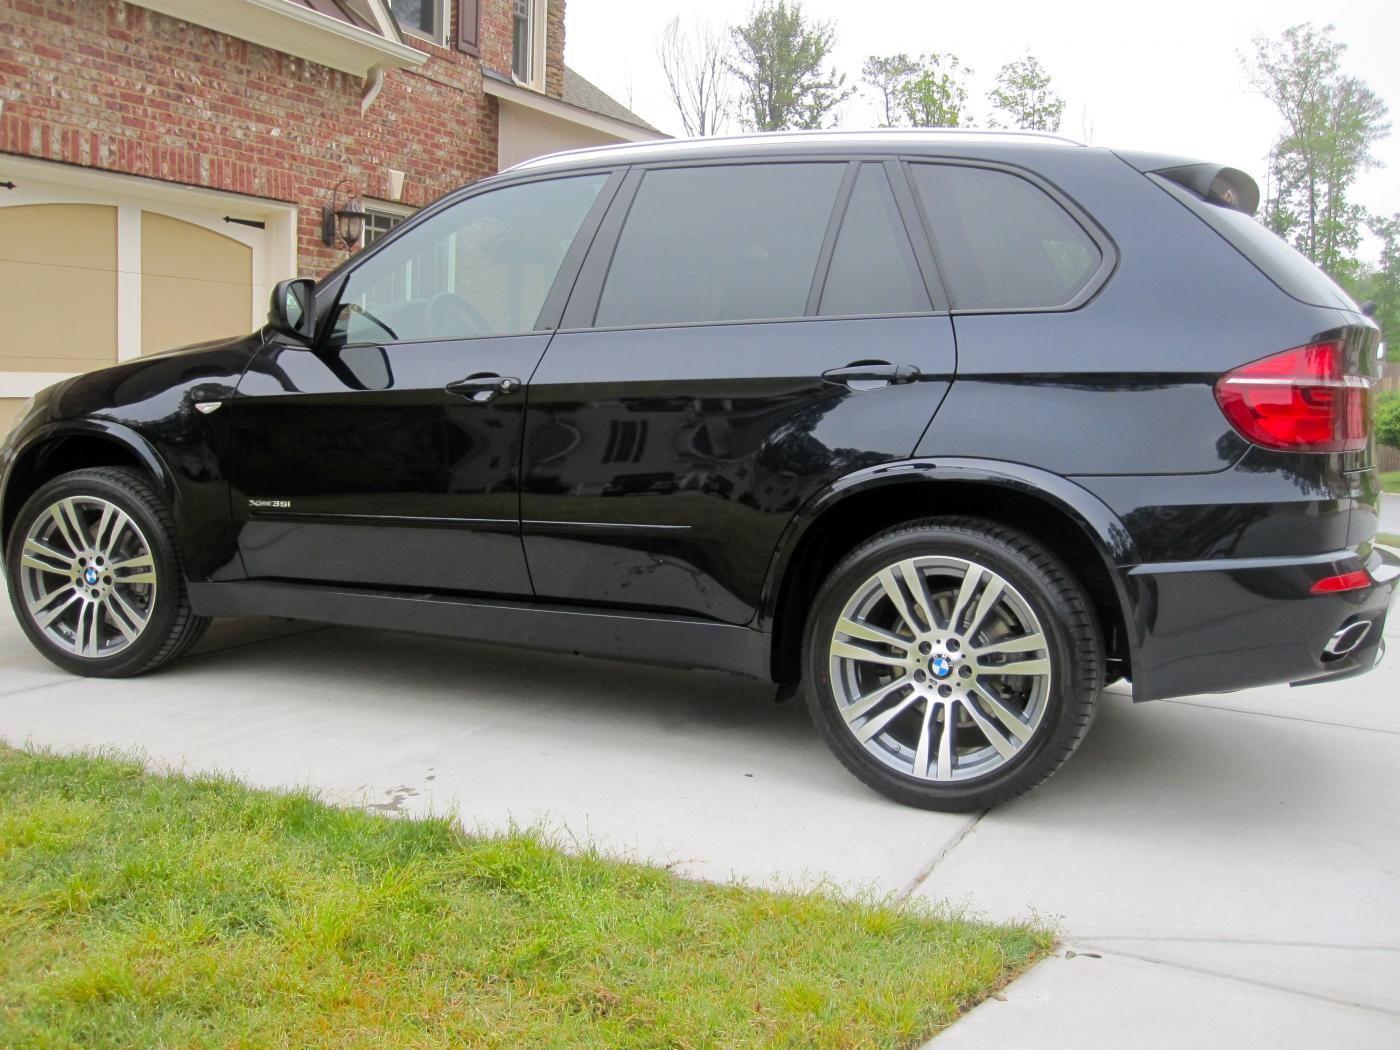 2012 x5 35i Carbon Black